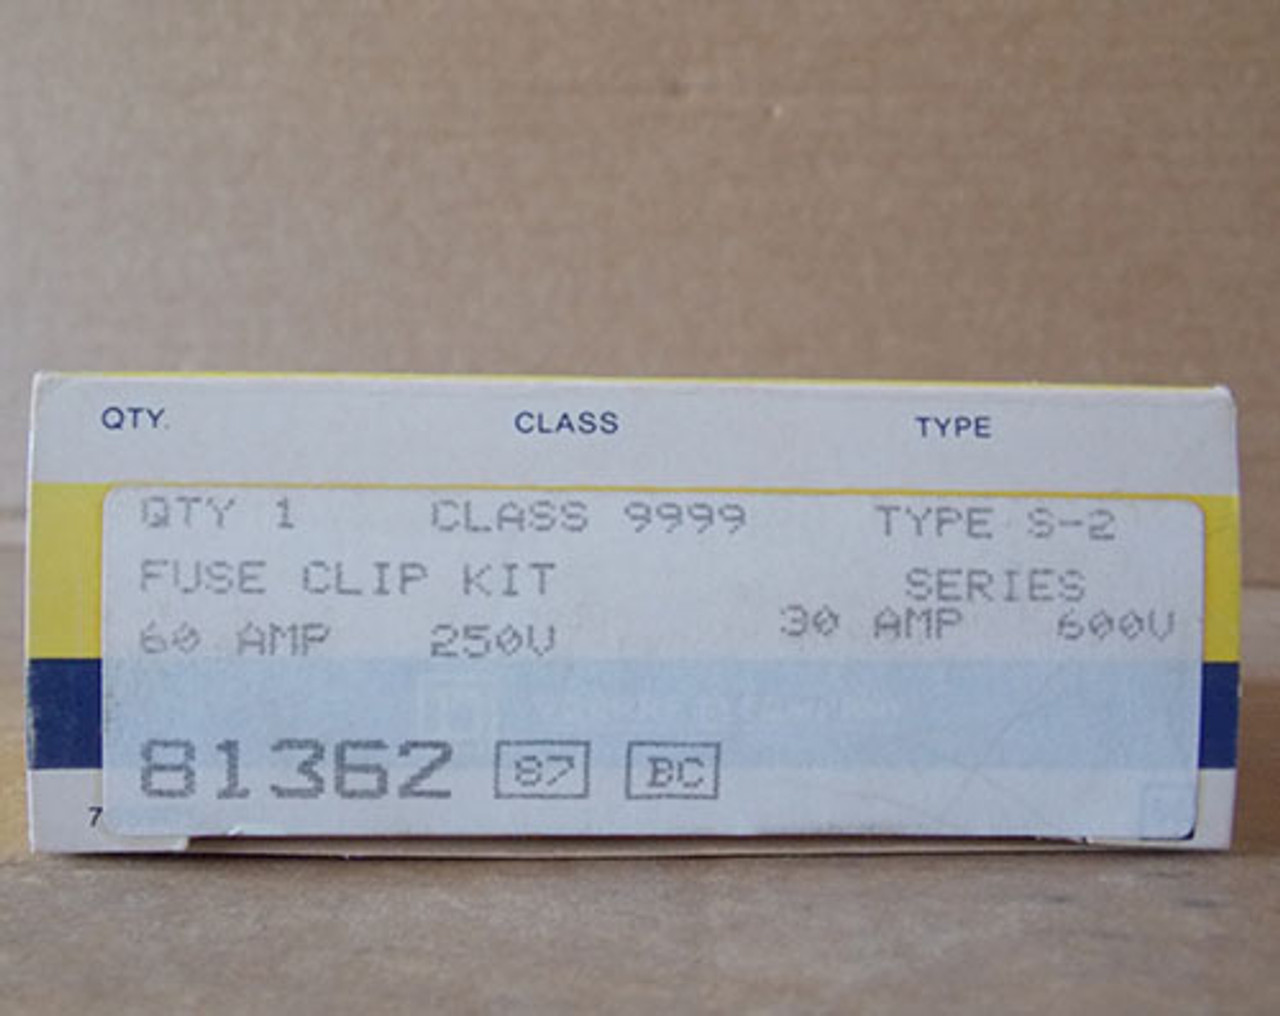 Square D 81362 Fuse Clip Kit 60A 250V, 30A 600V Type S-2 - New